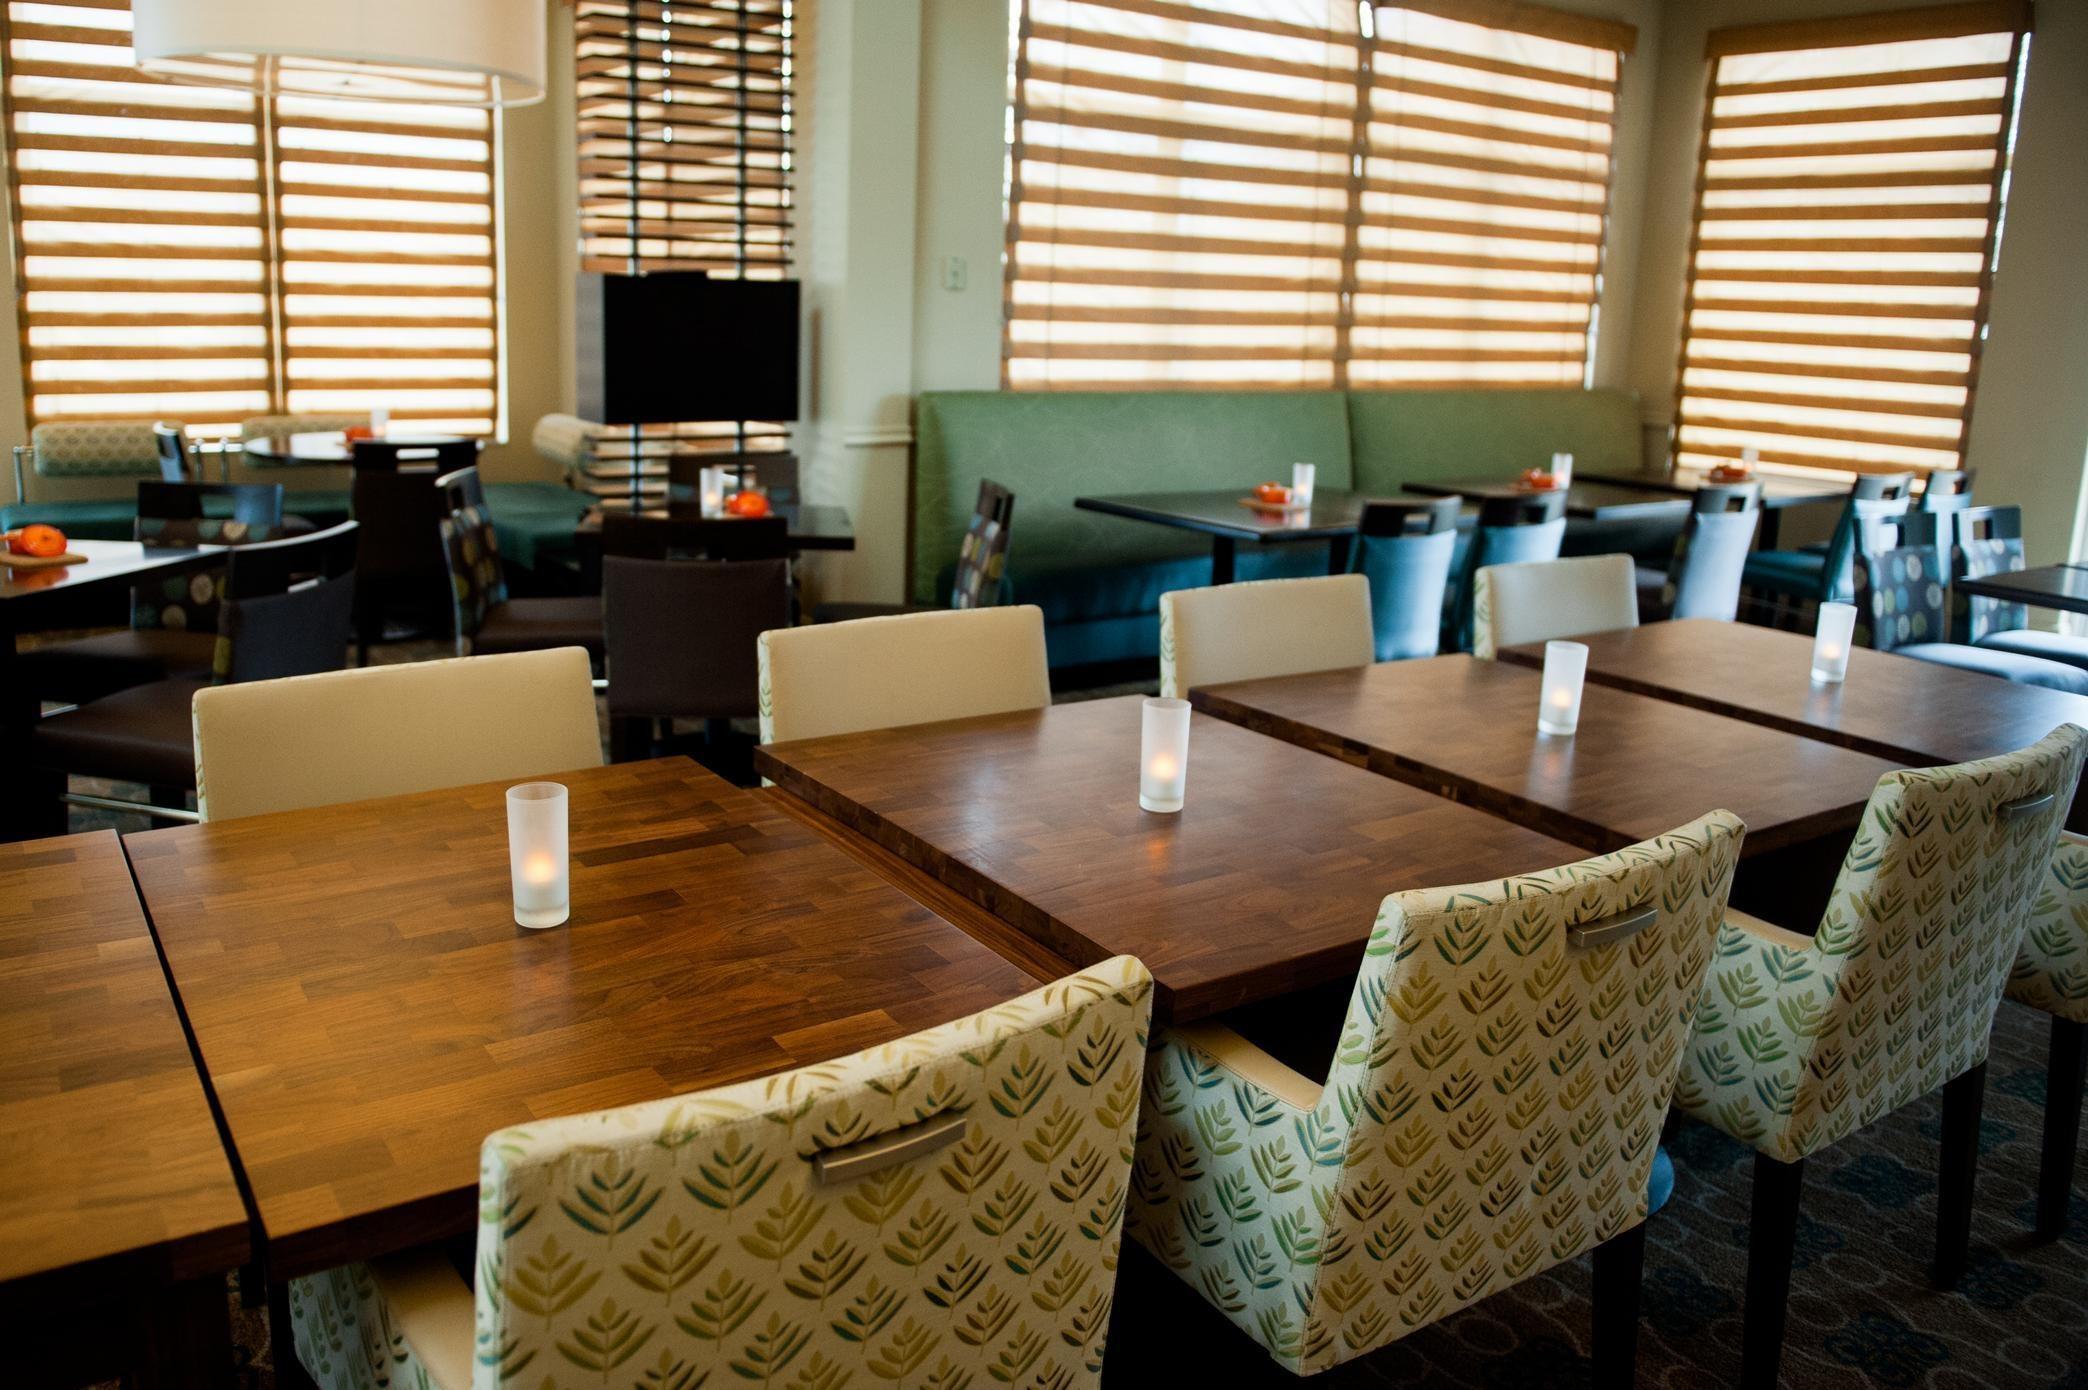 Hilton Garden Inn Rockaway image 3